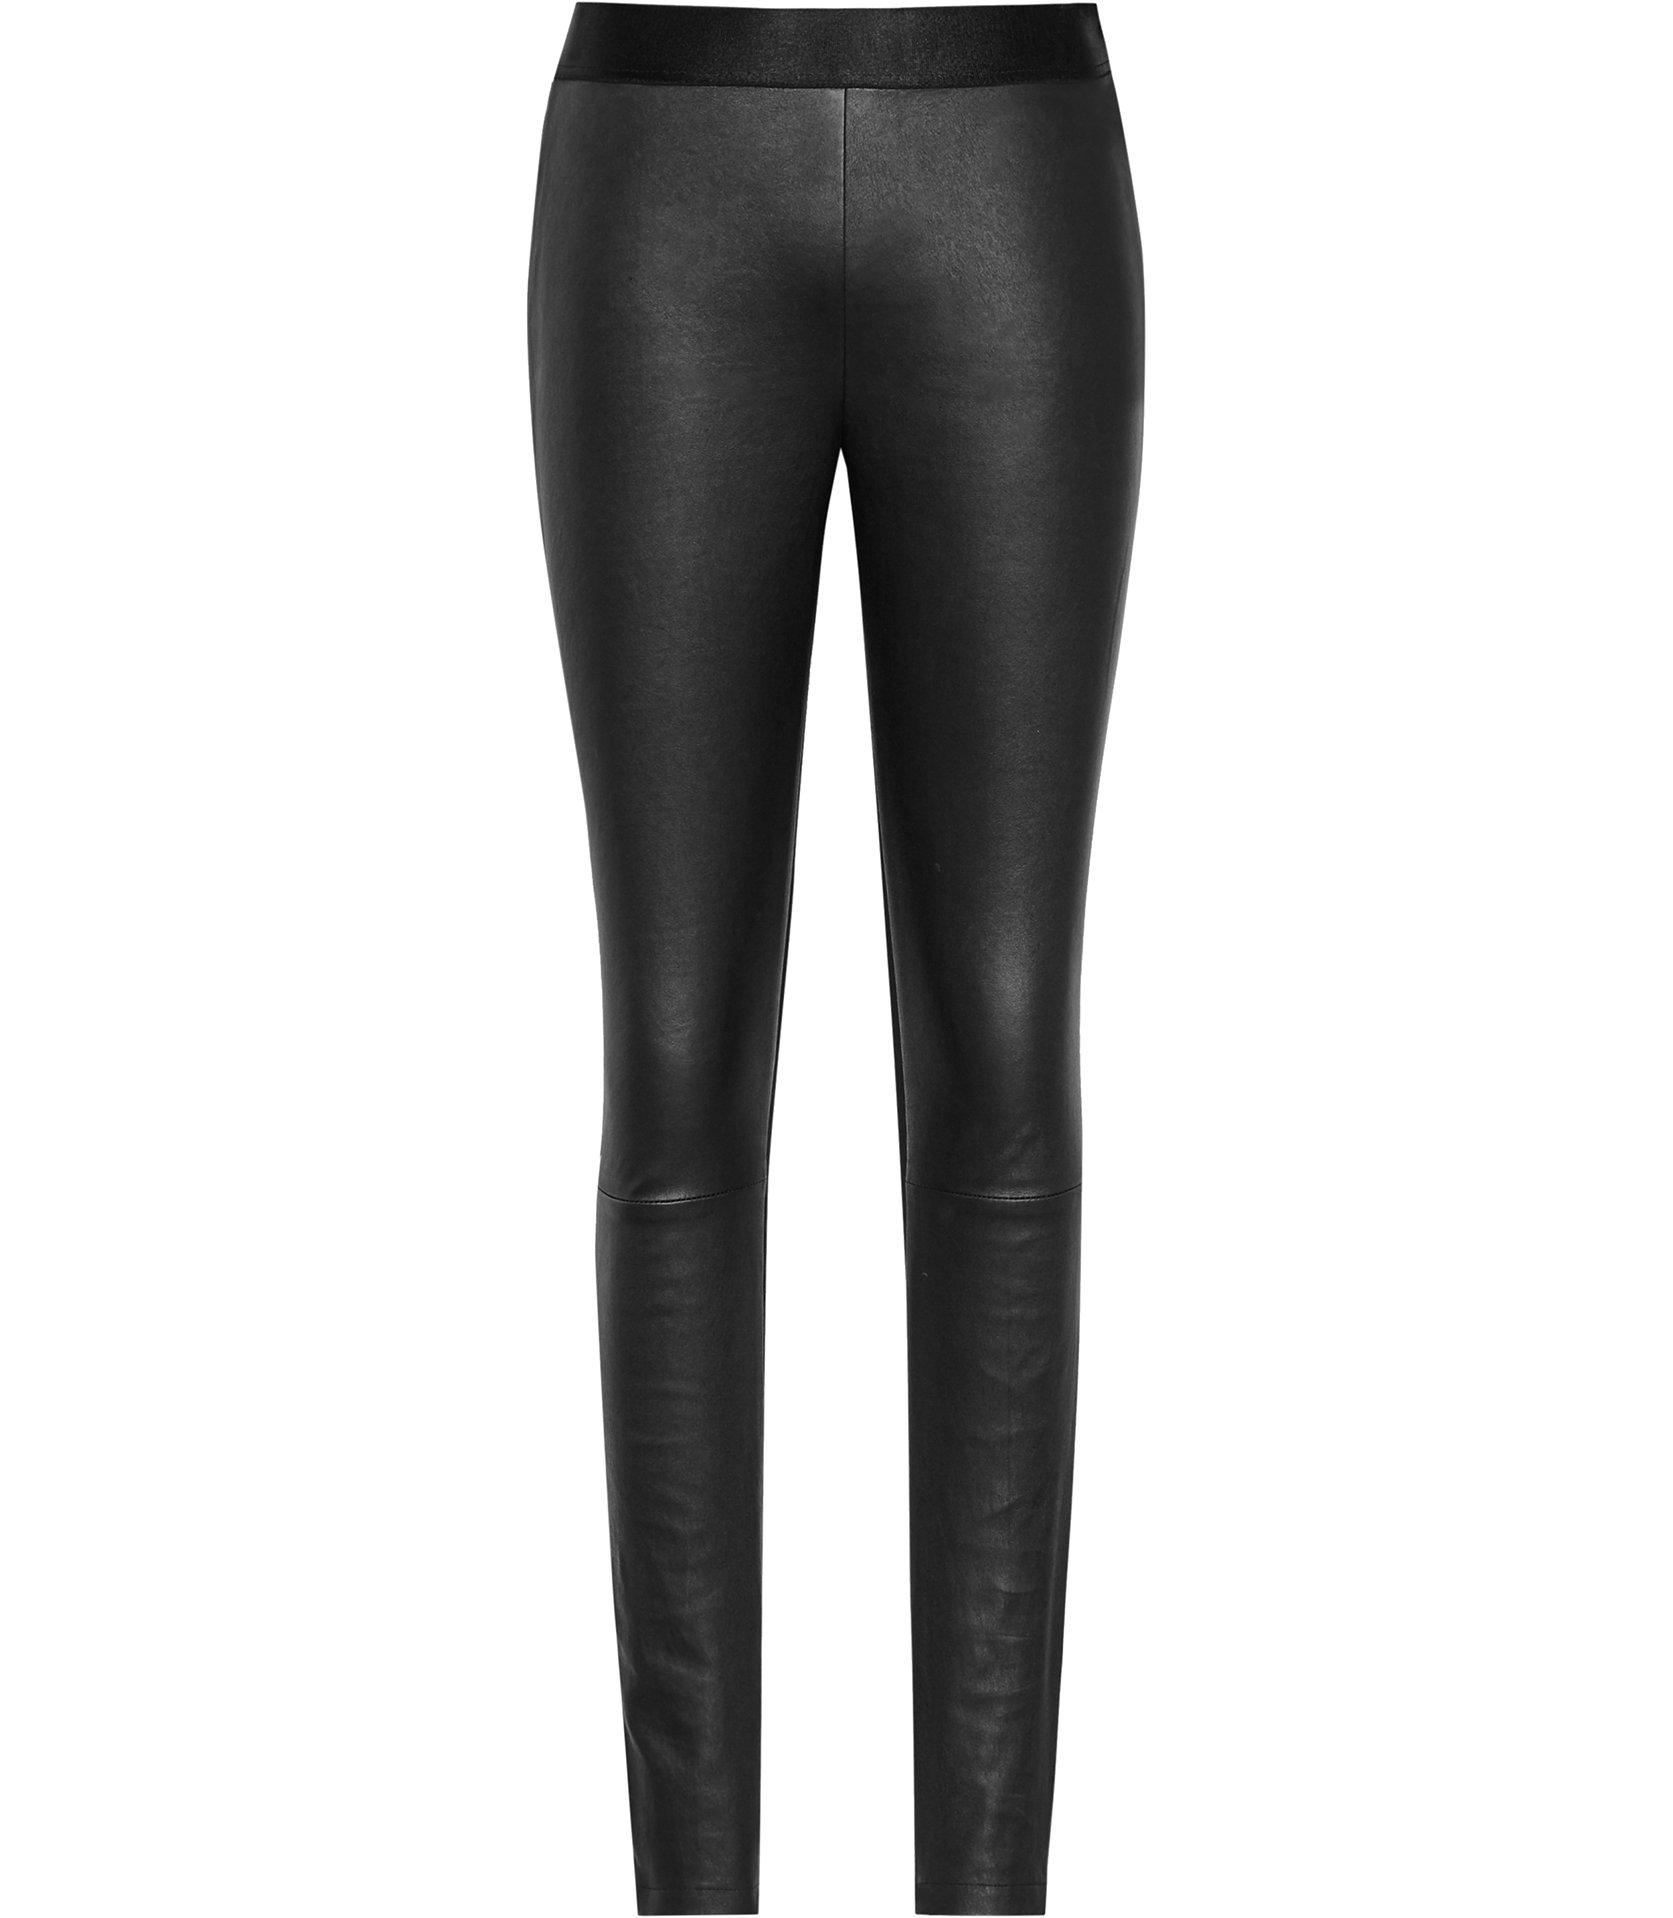 Knole Black Leather Leggings, Dhs1,795.